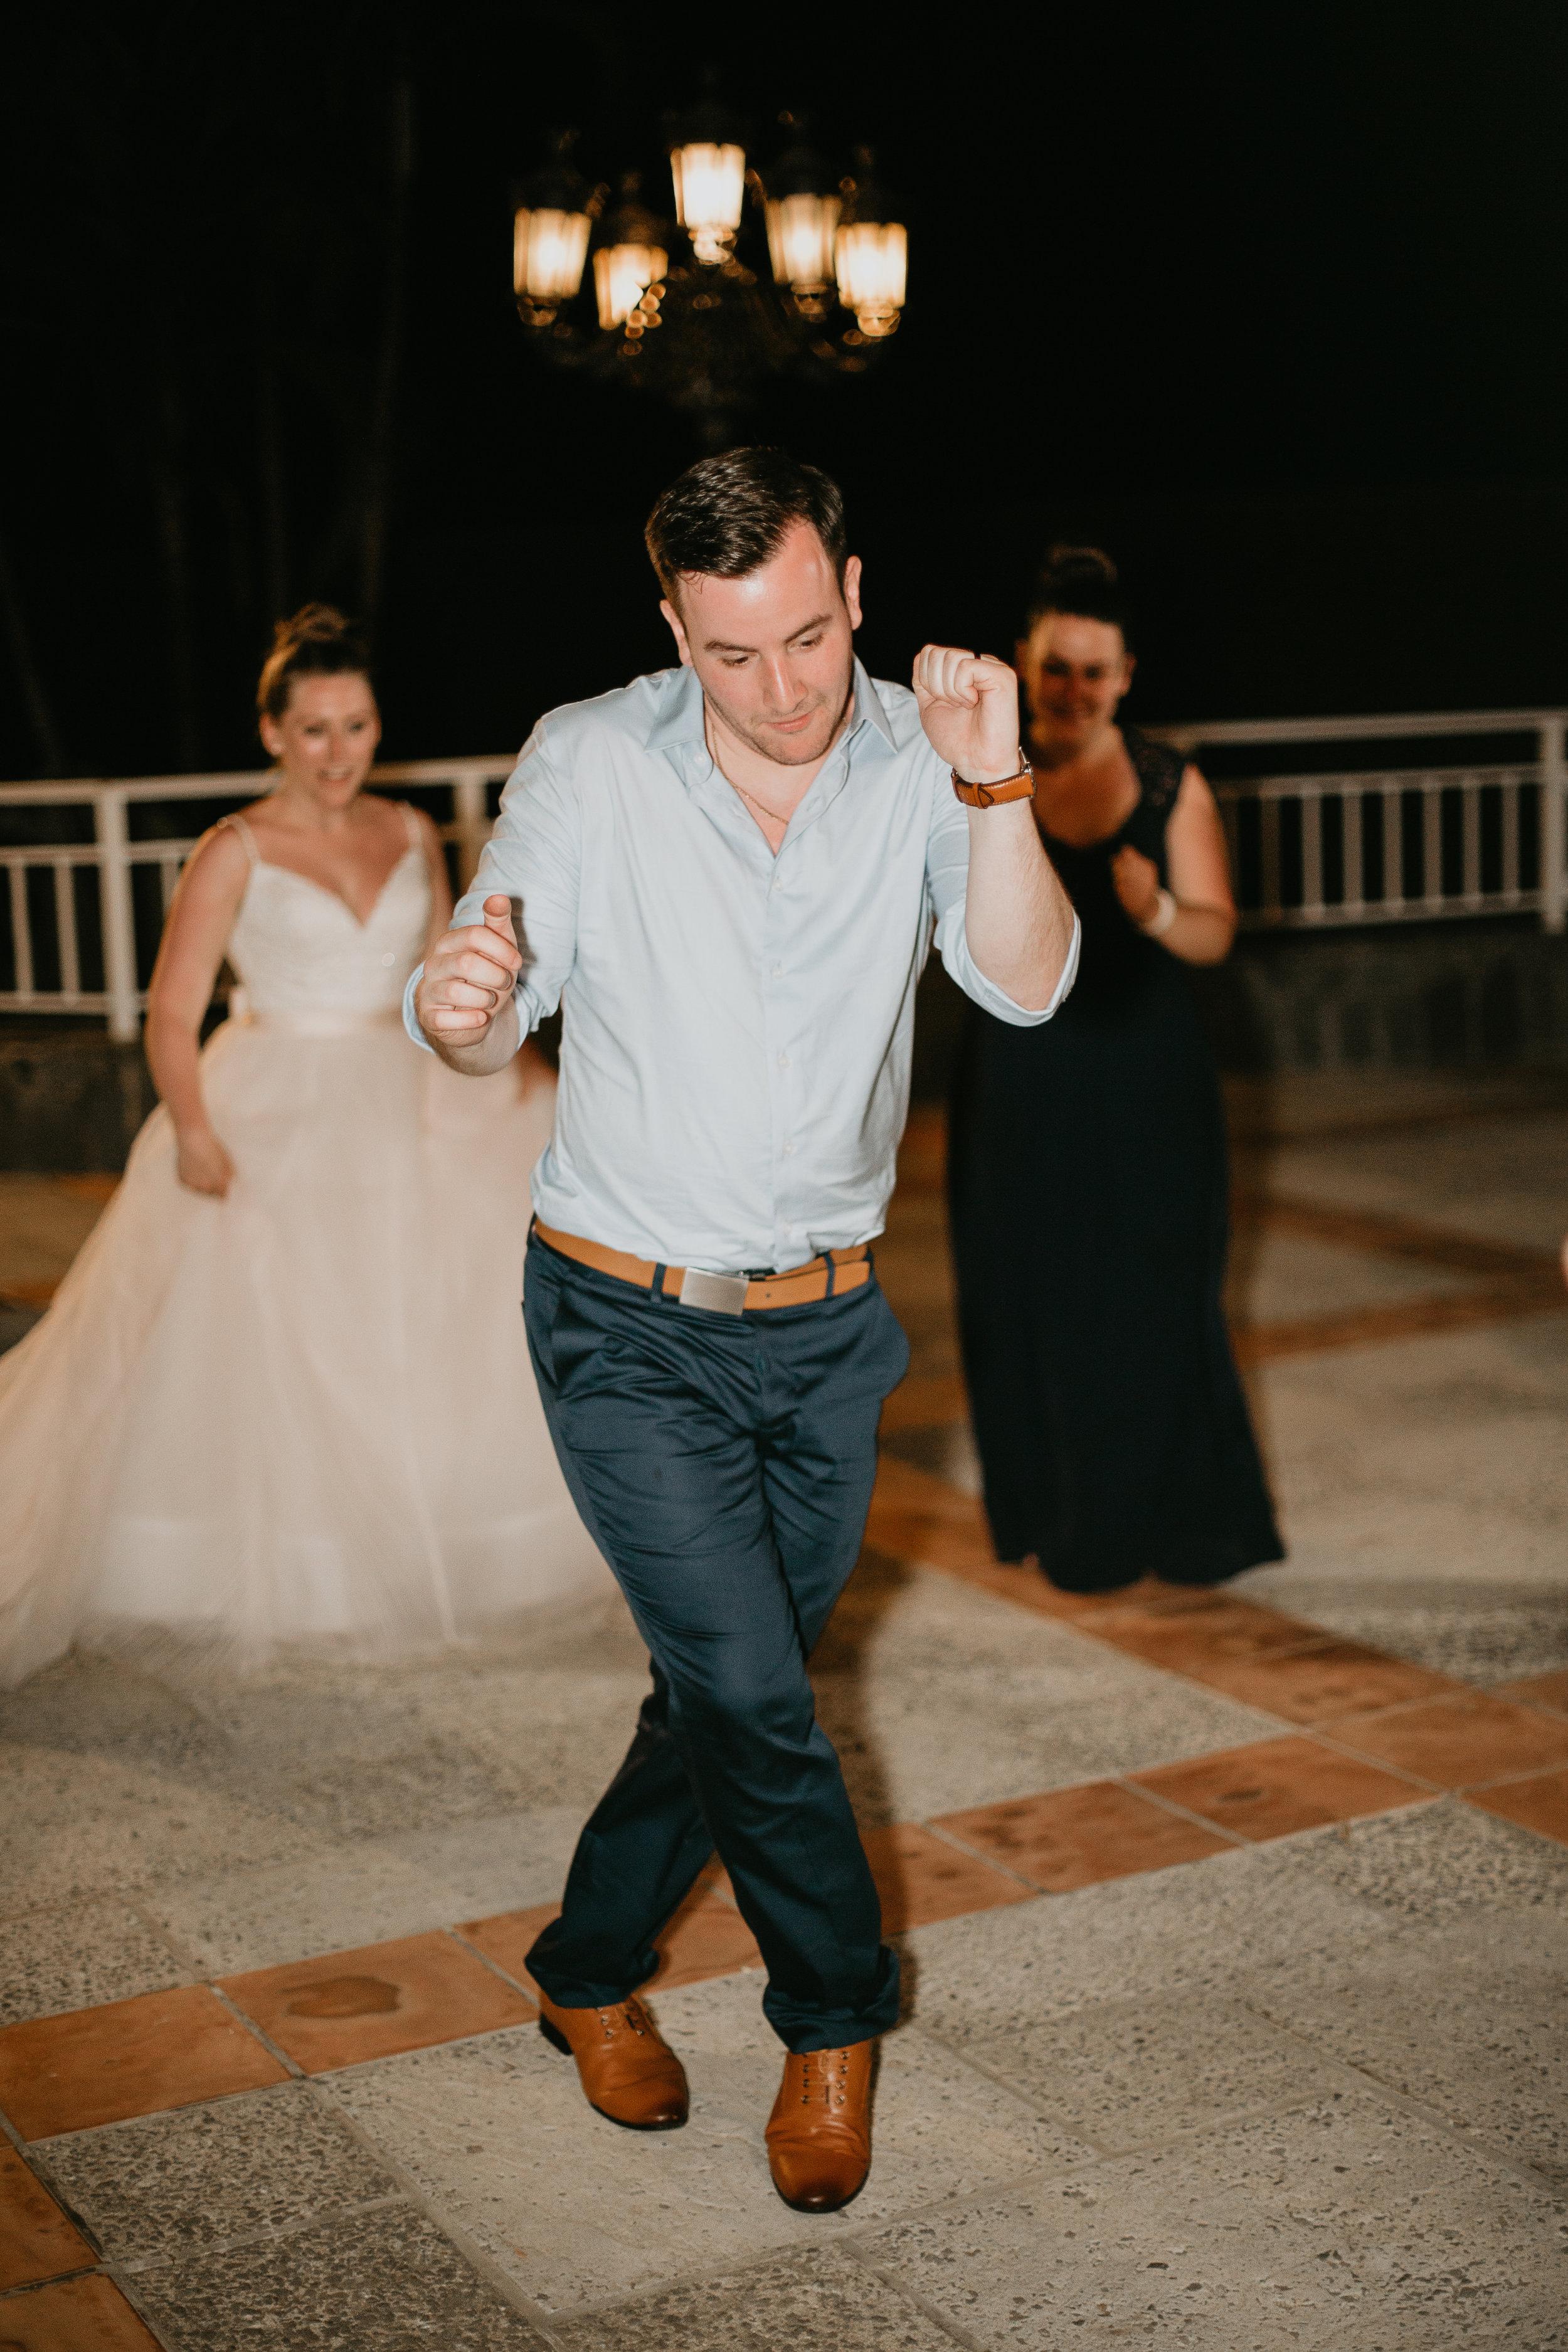 nicole-daacke-photography-destination-wedding-in-st-lucia-sandals-la-toc-intimate-island-wedding-carribean-elopement-photographer-chill-island-wedding-170.jpg